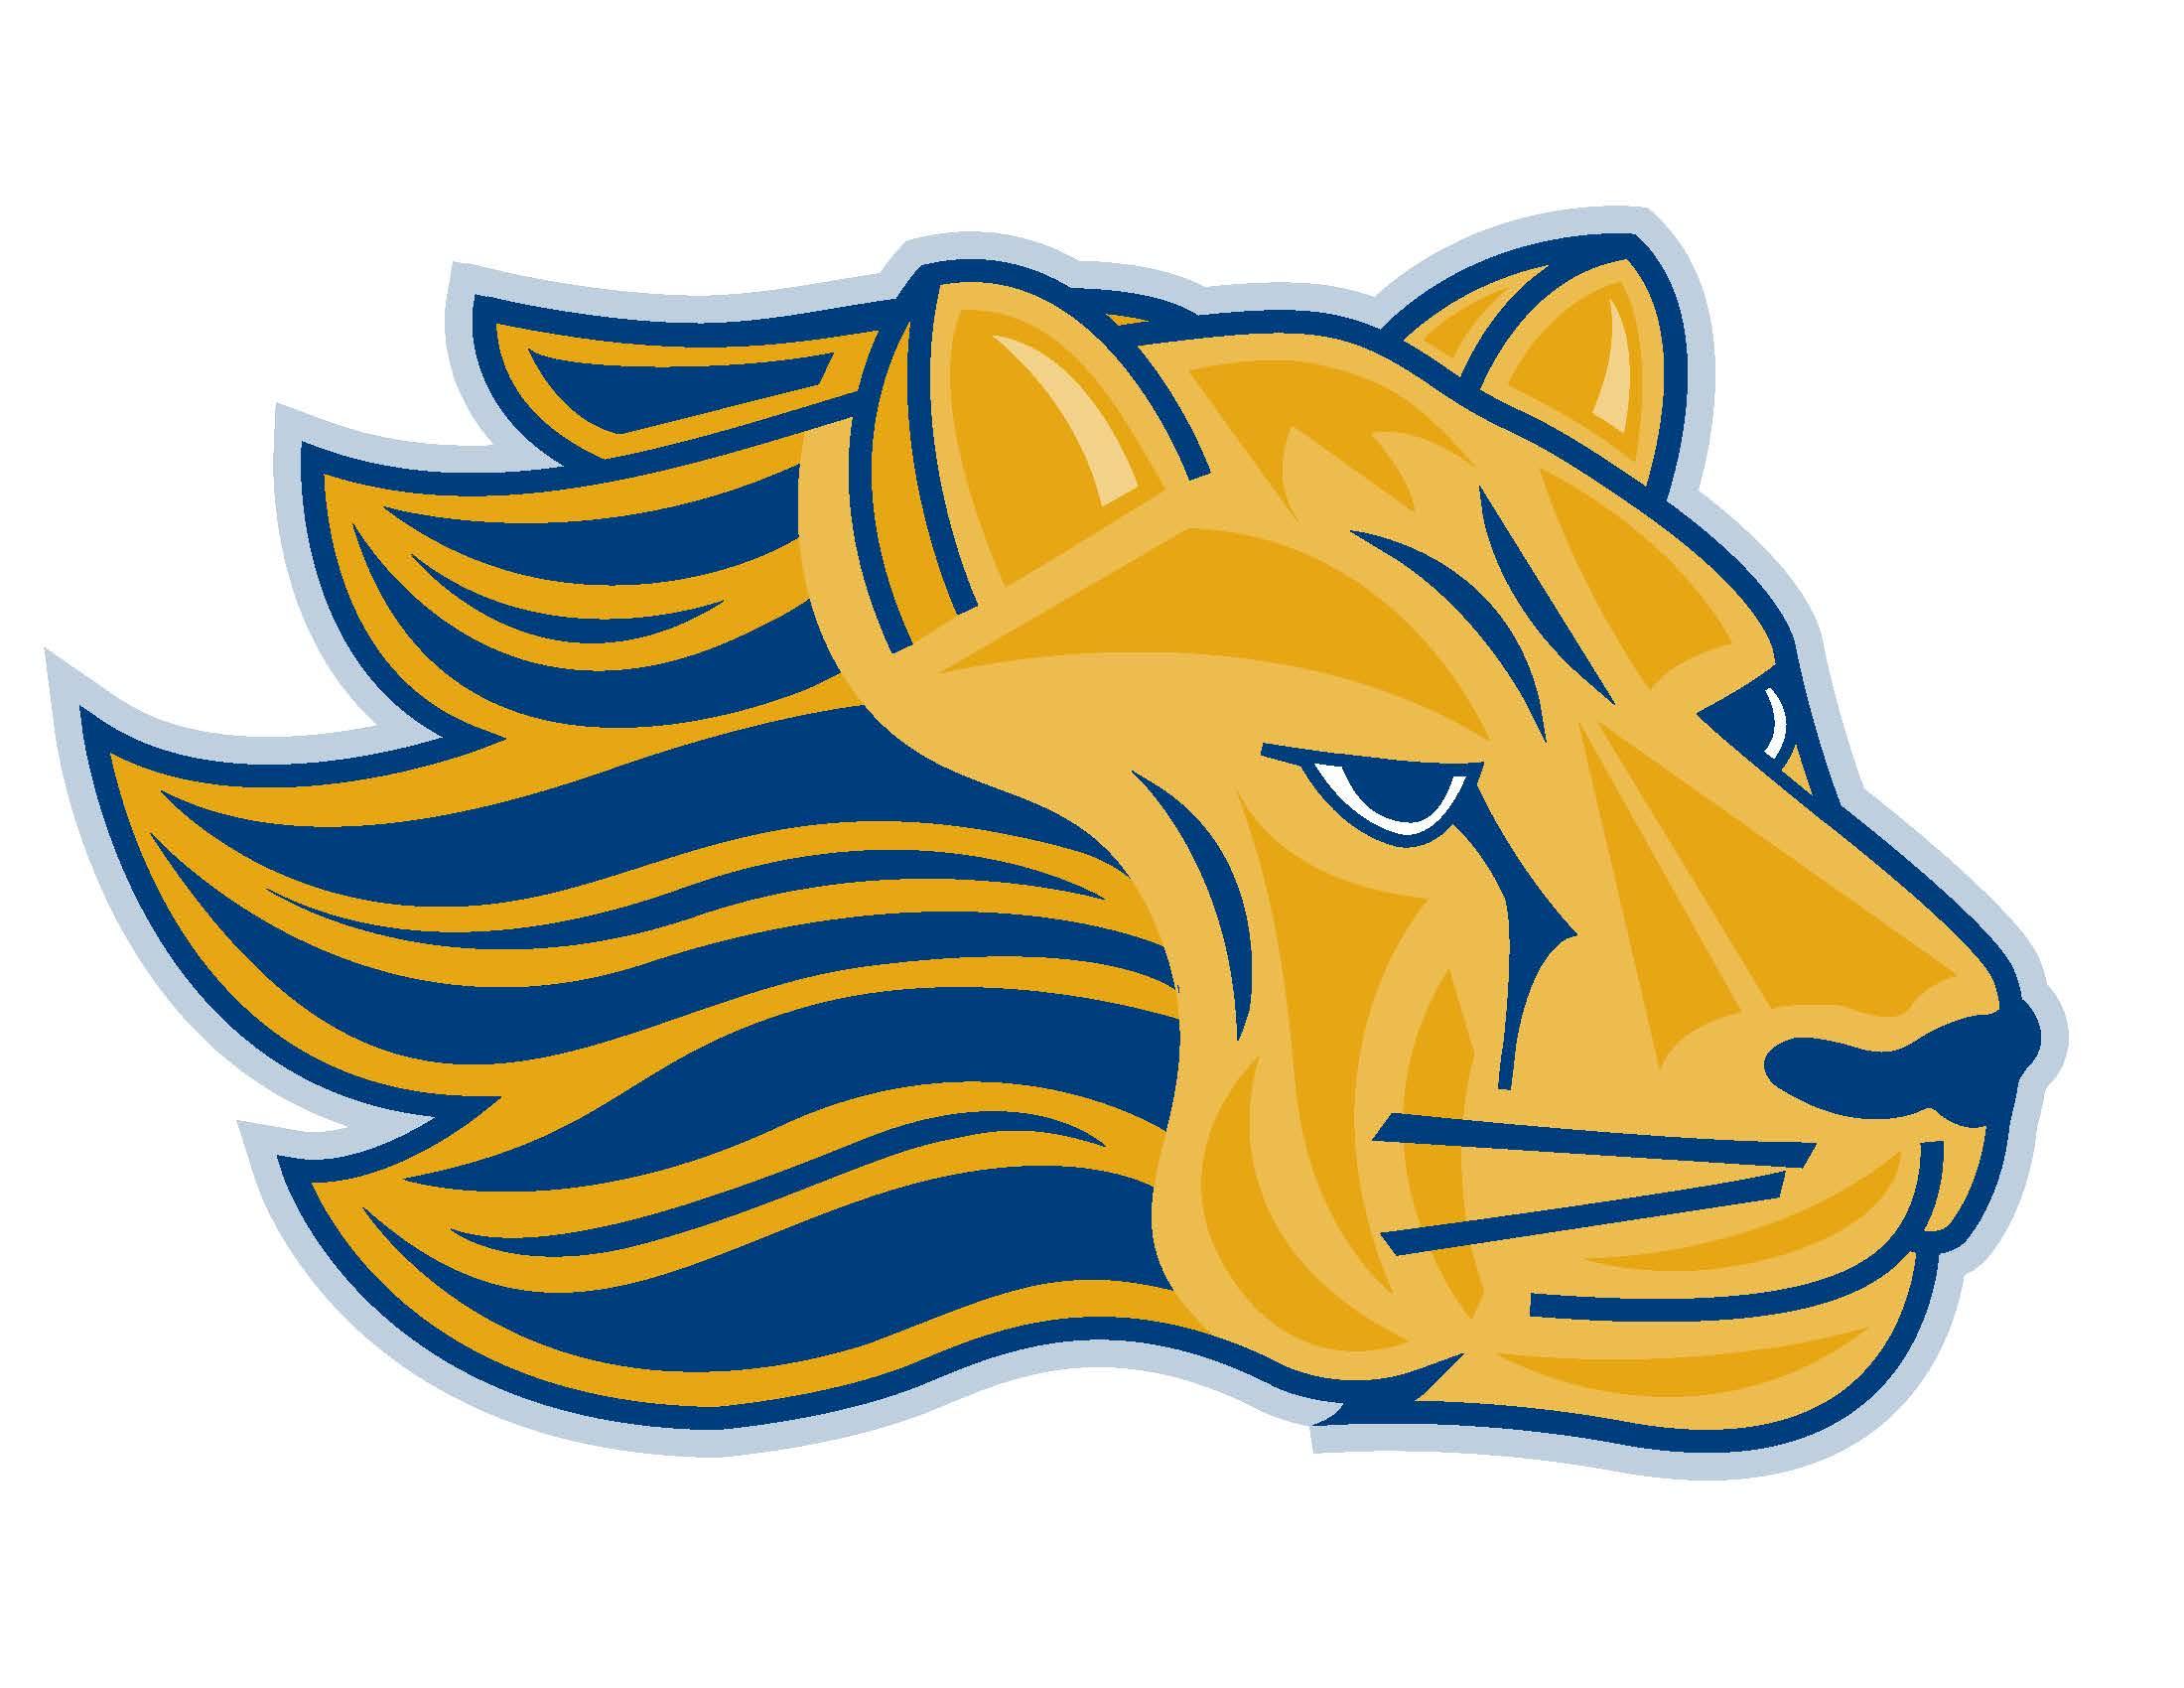 Final Mascot Lion 2013